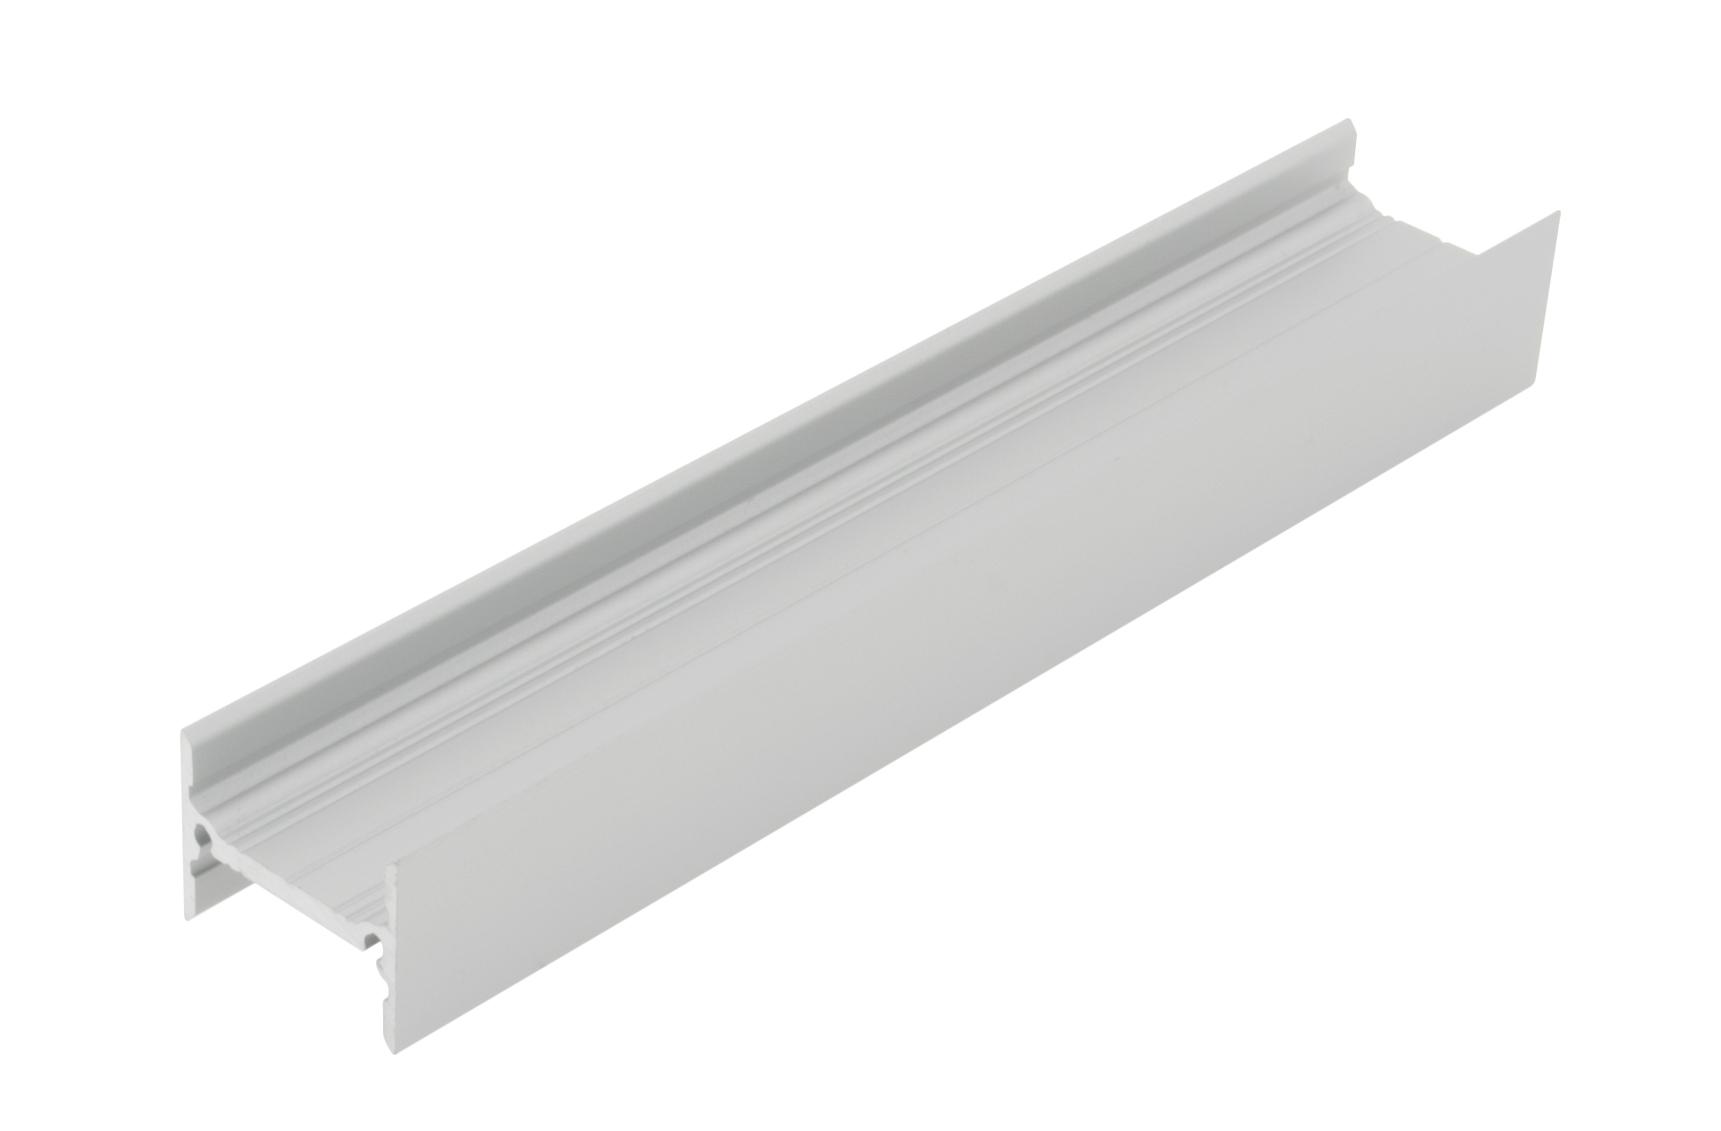 1 m Aluminium Profil TBH, 2m LIAP002007